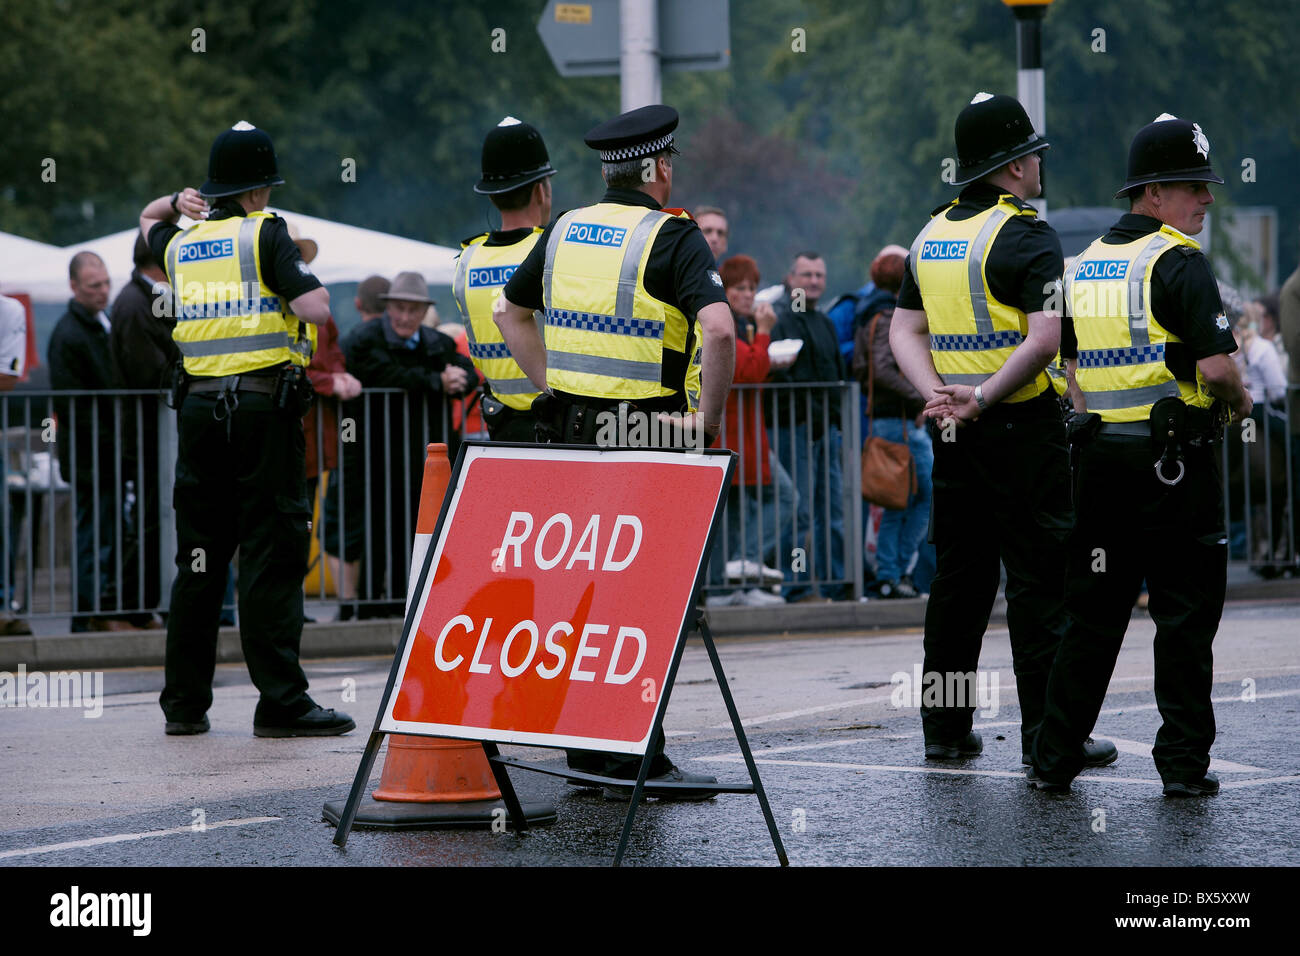 Police line cordon block the main street in Appleby, Cumbria, uk - Stock Image